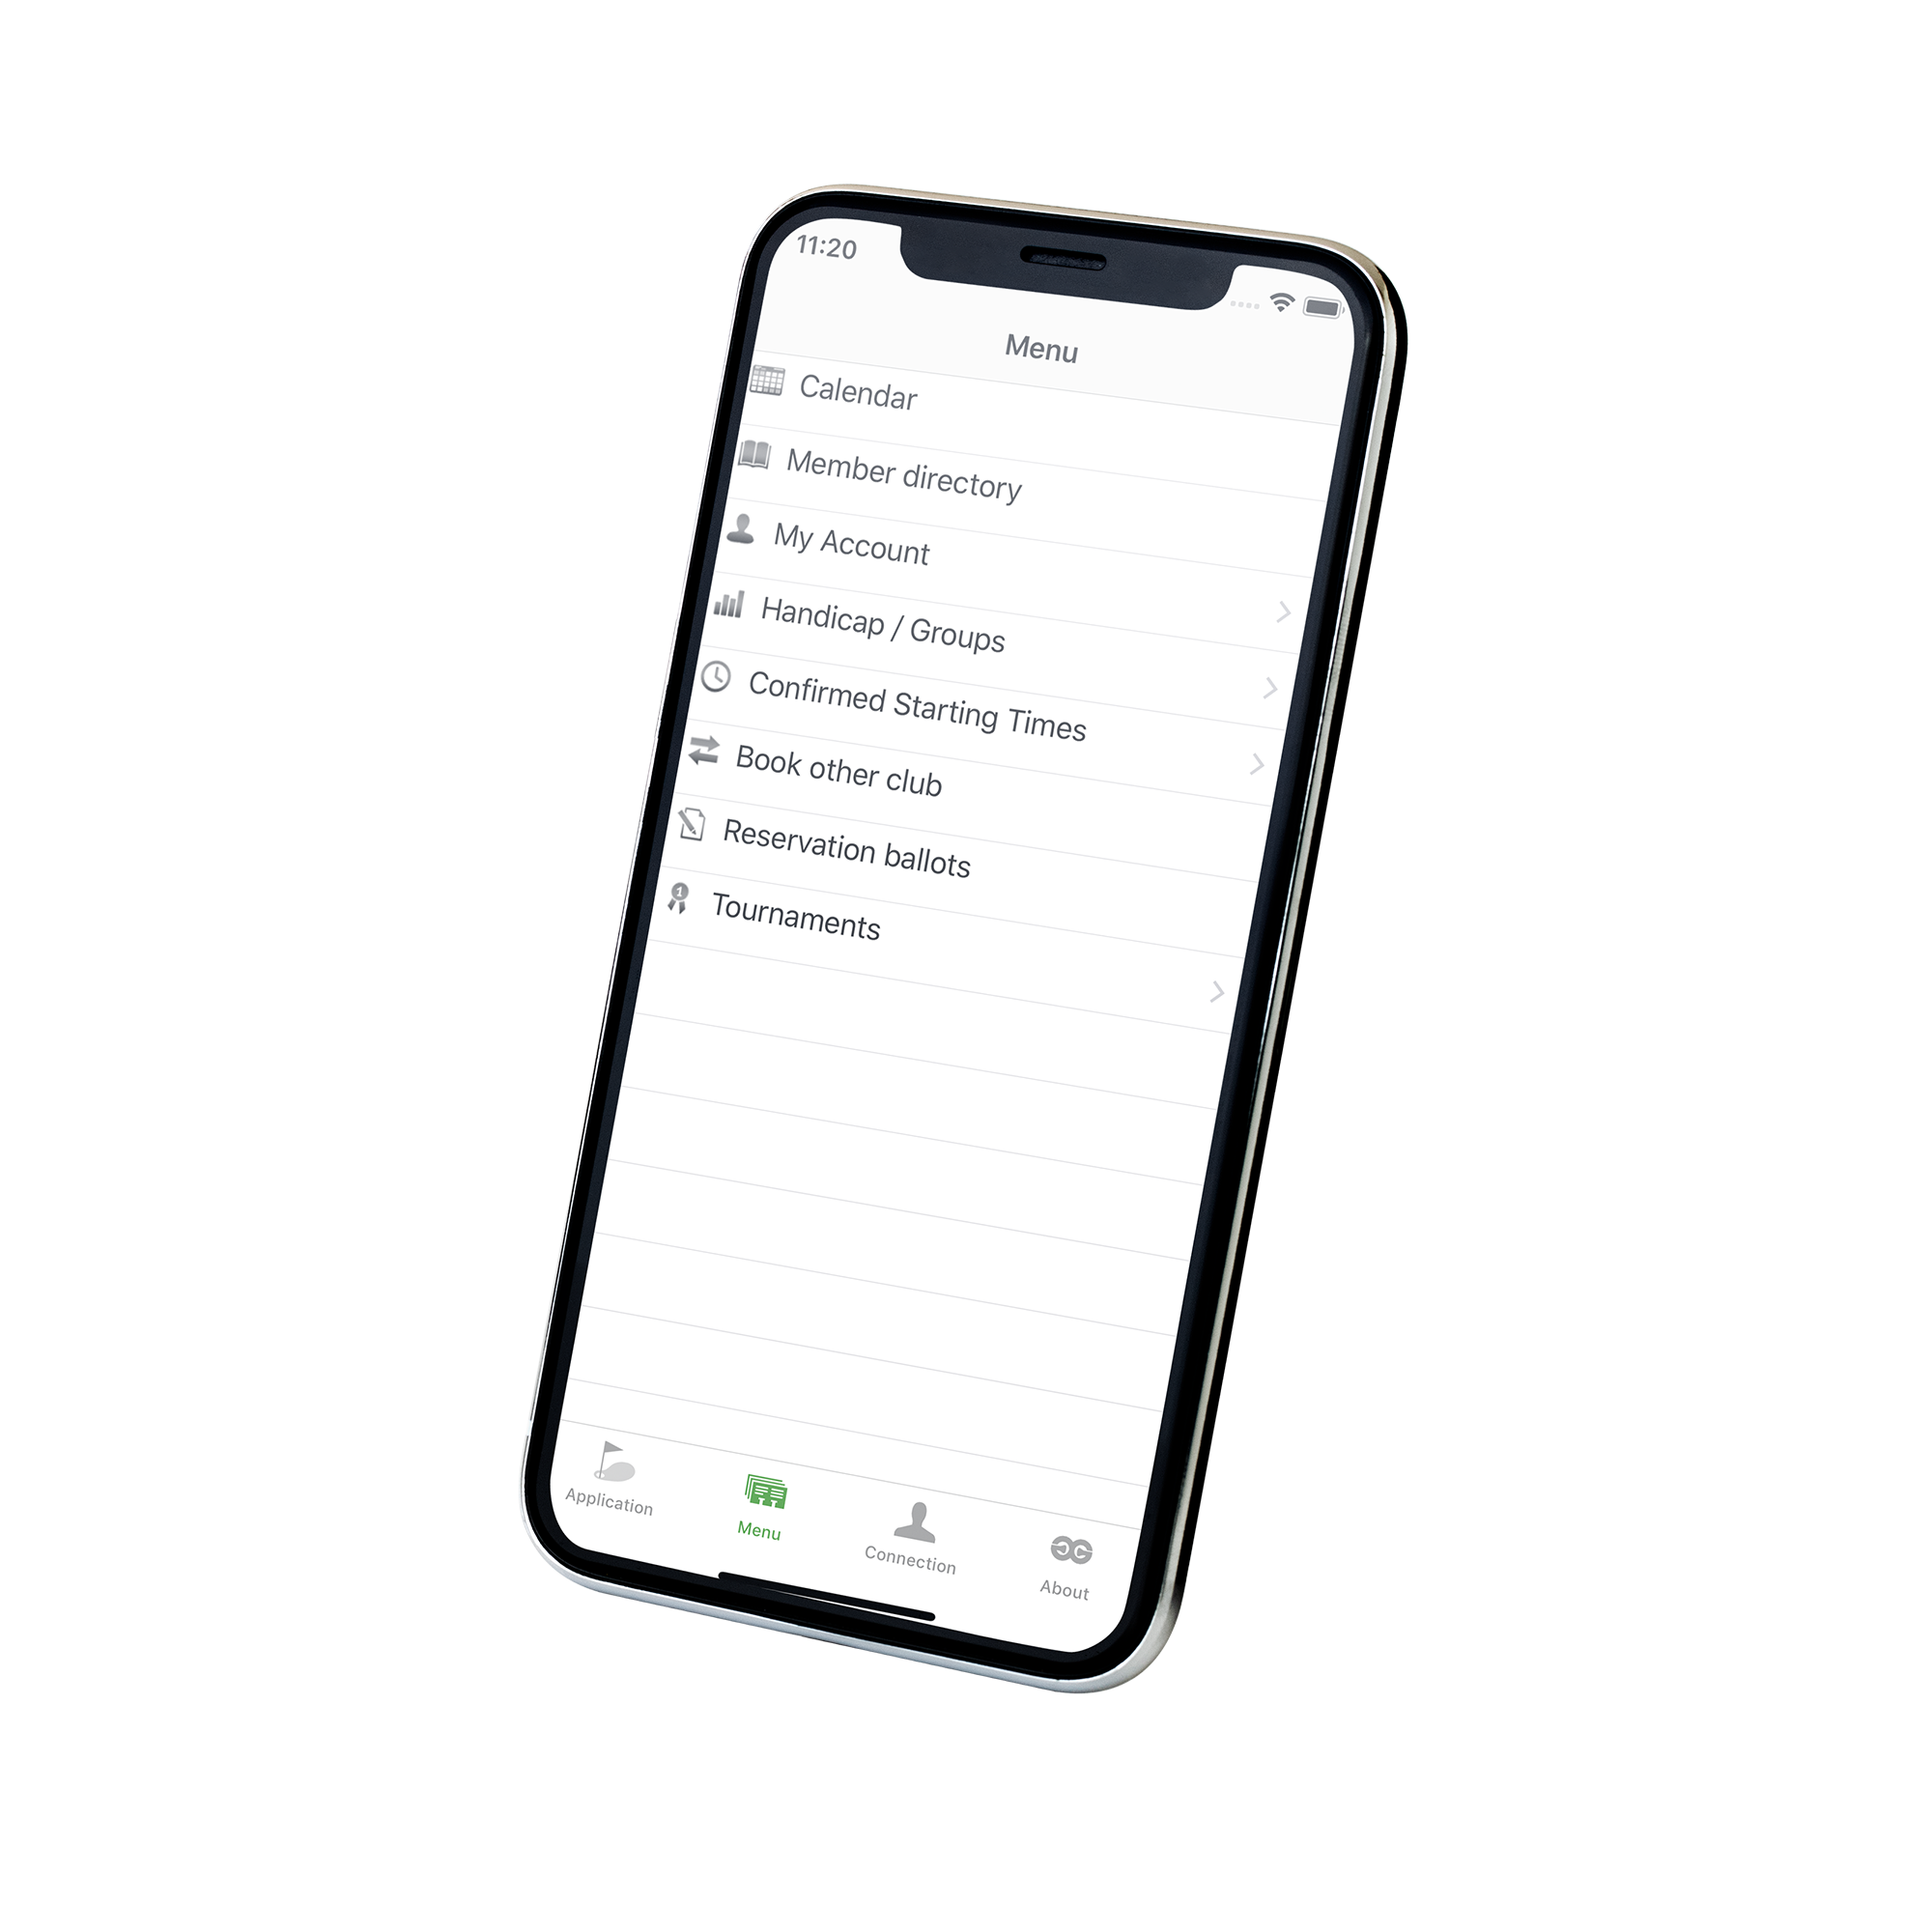 Phone Mockup - slanted